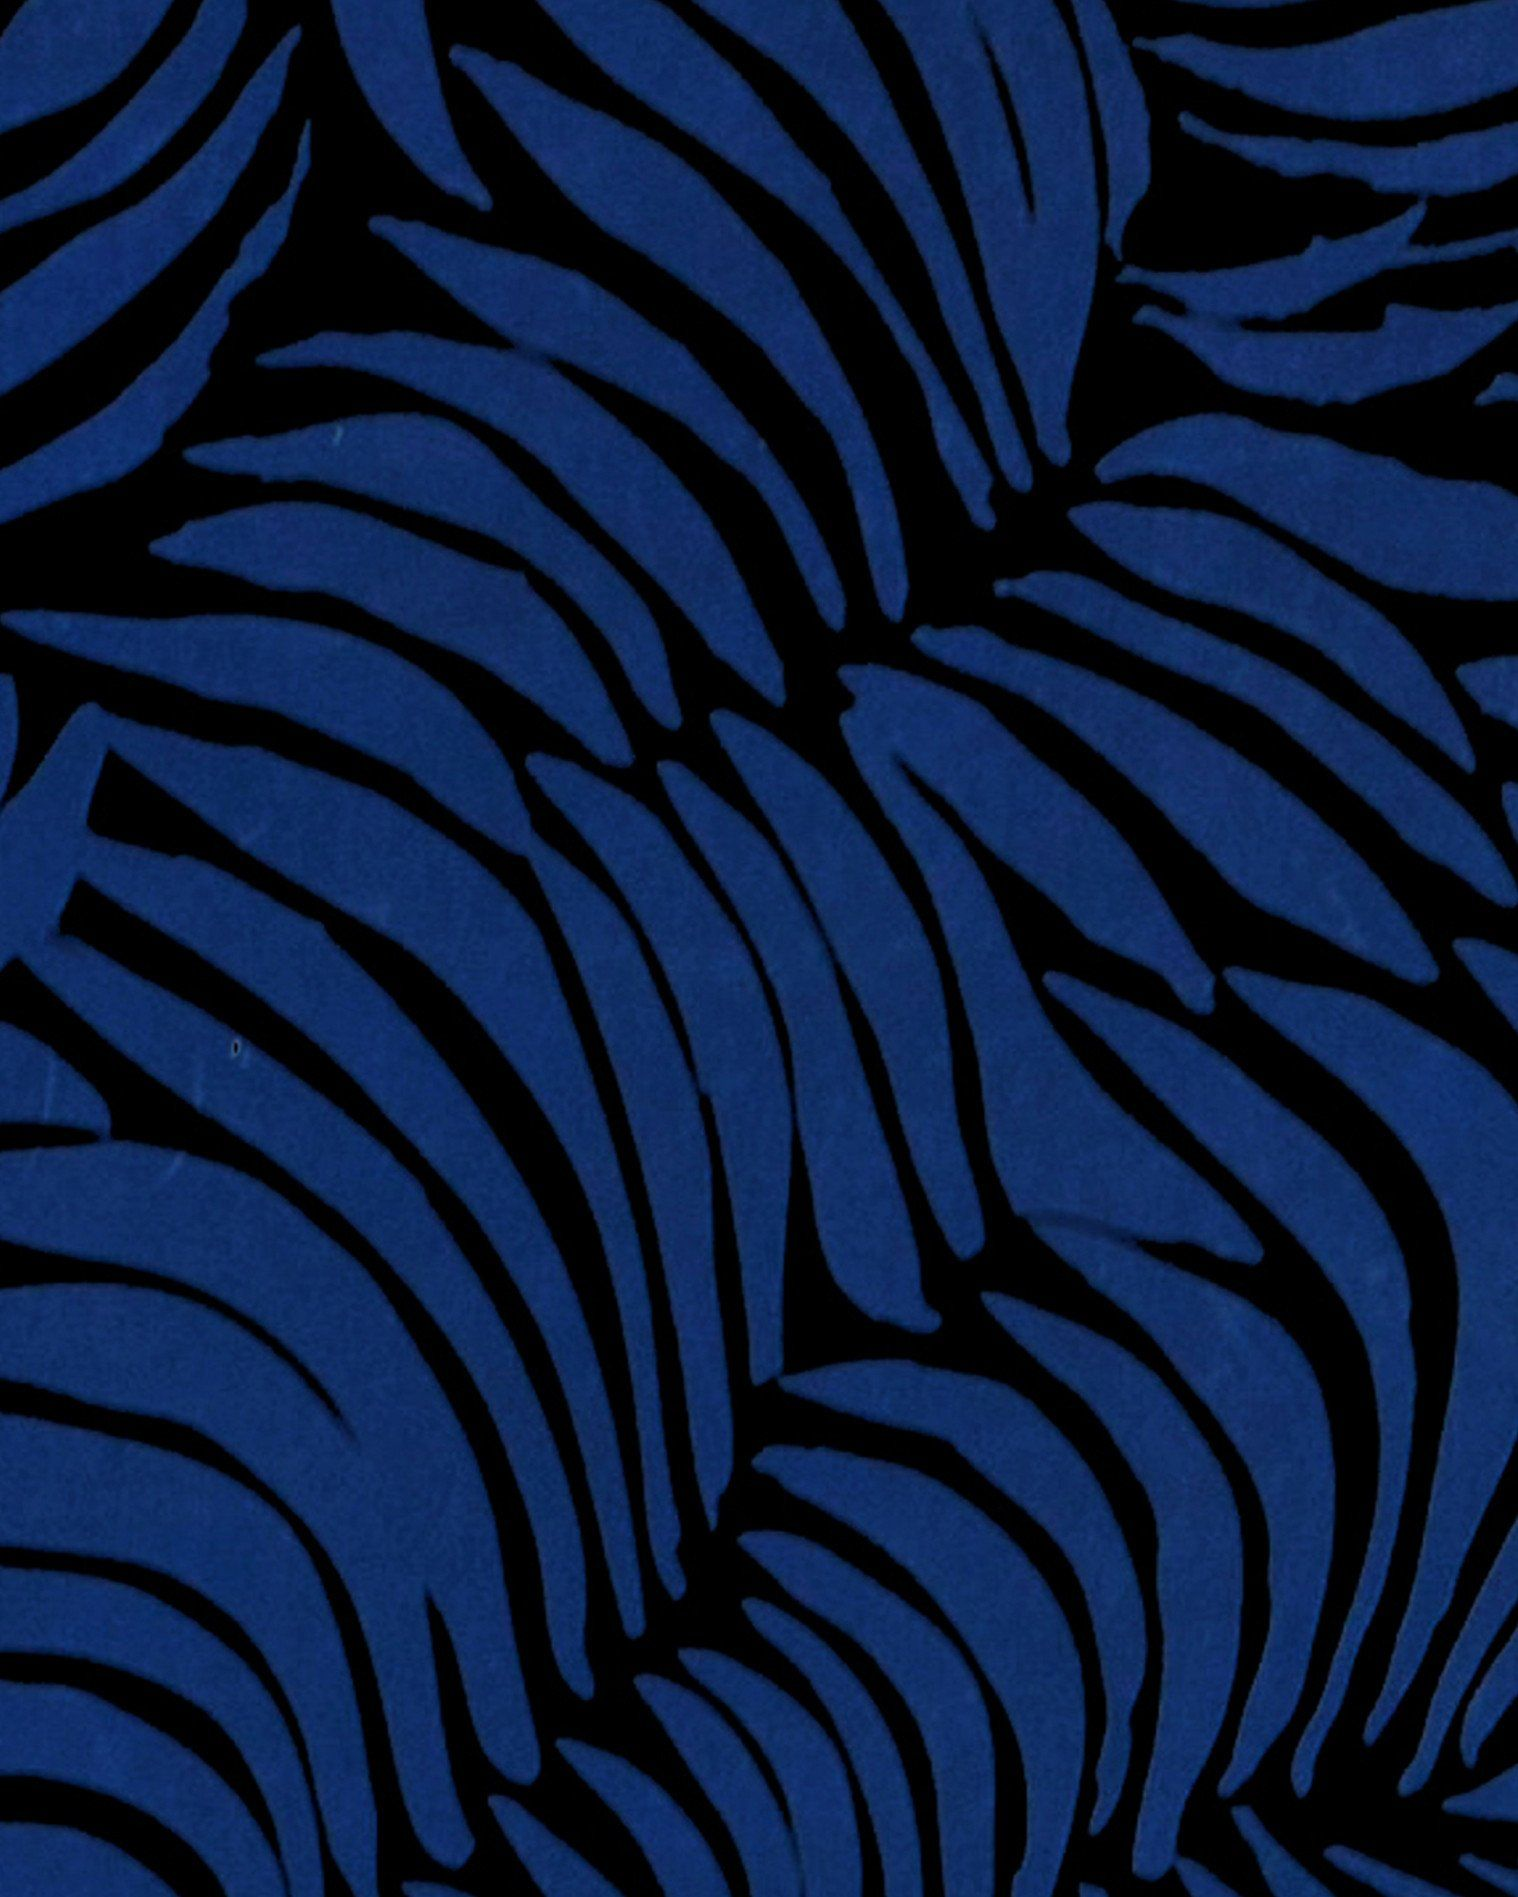 Sample Plume Wallpaper in Midnight design by Jill Malek